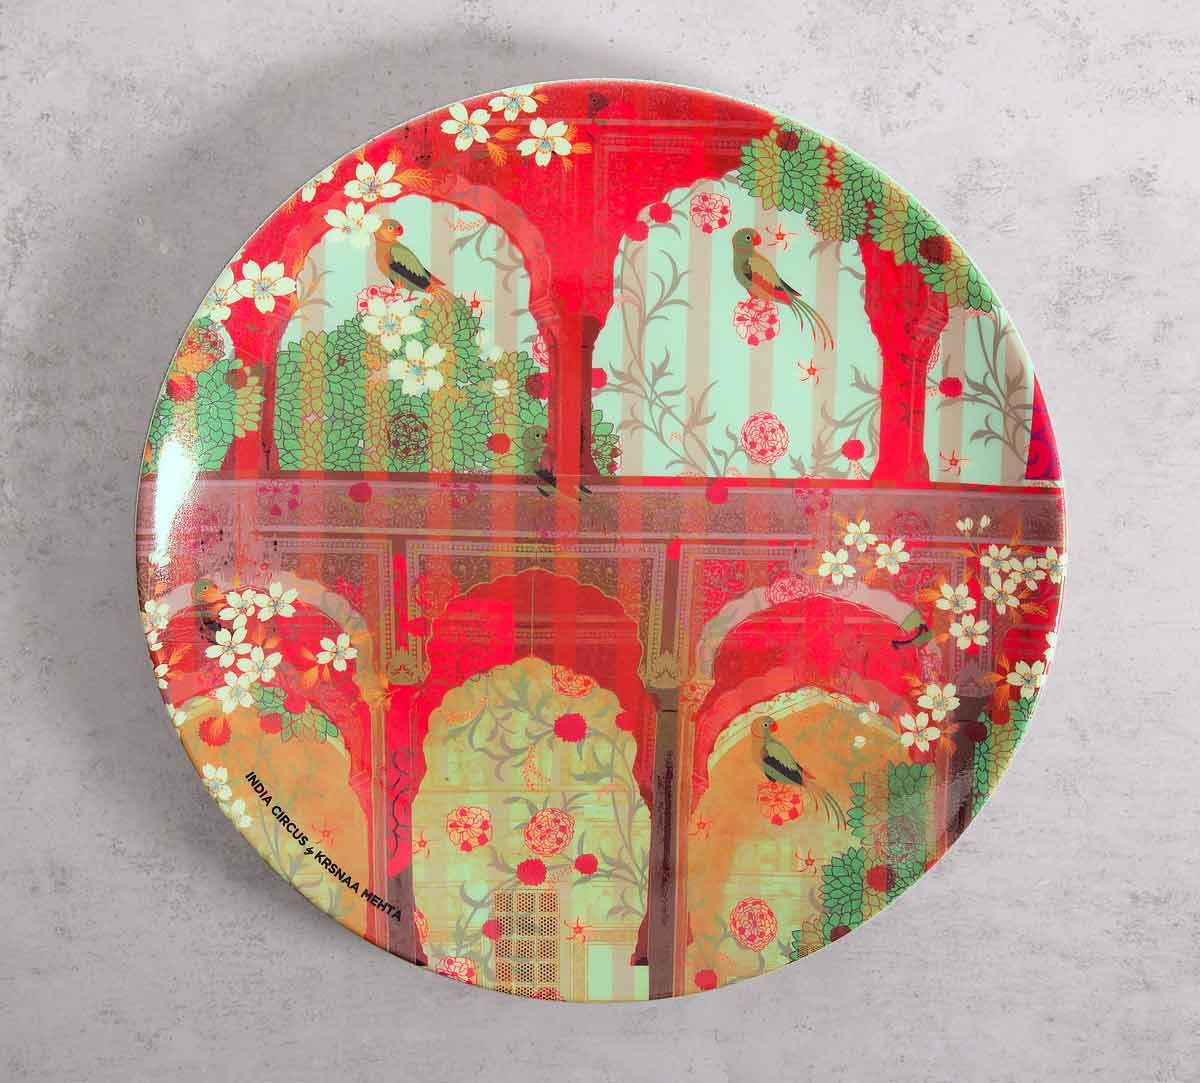 India Circus Capacious Corridor 10 inch Decorative and Snacks Platter